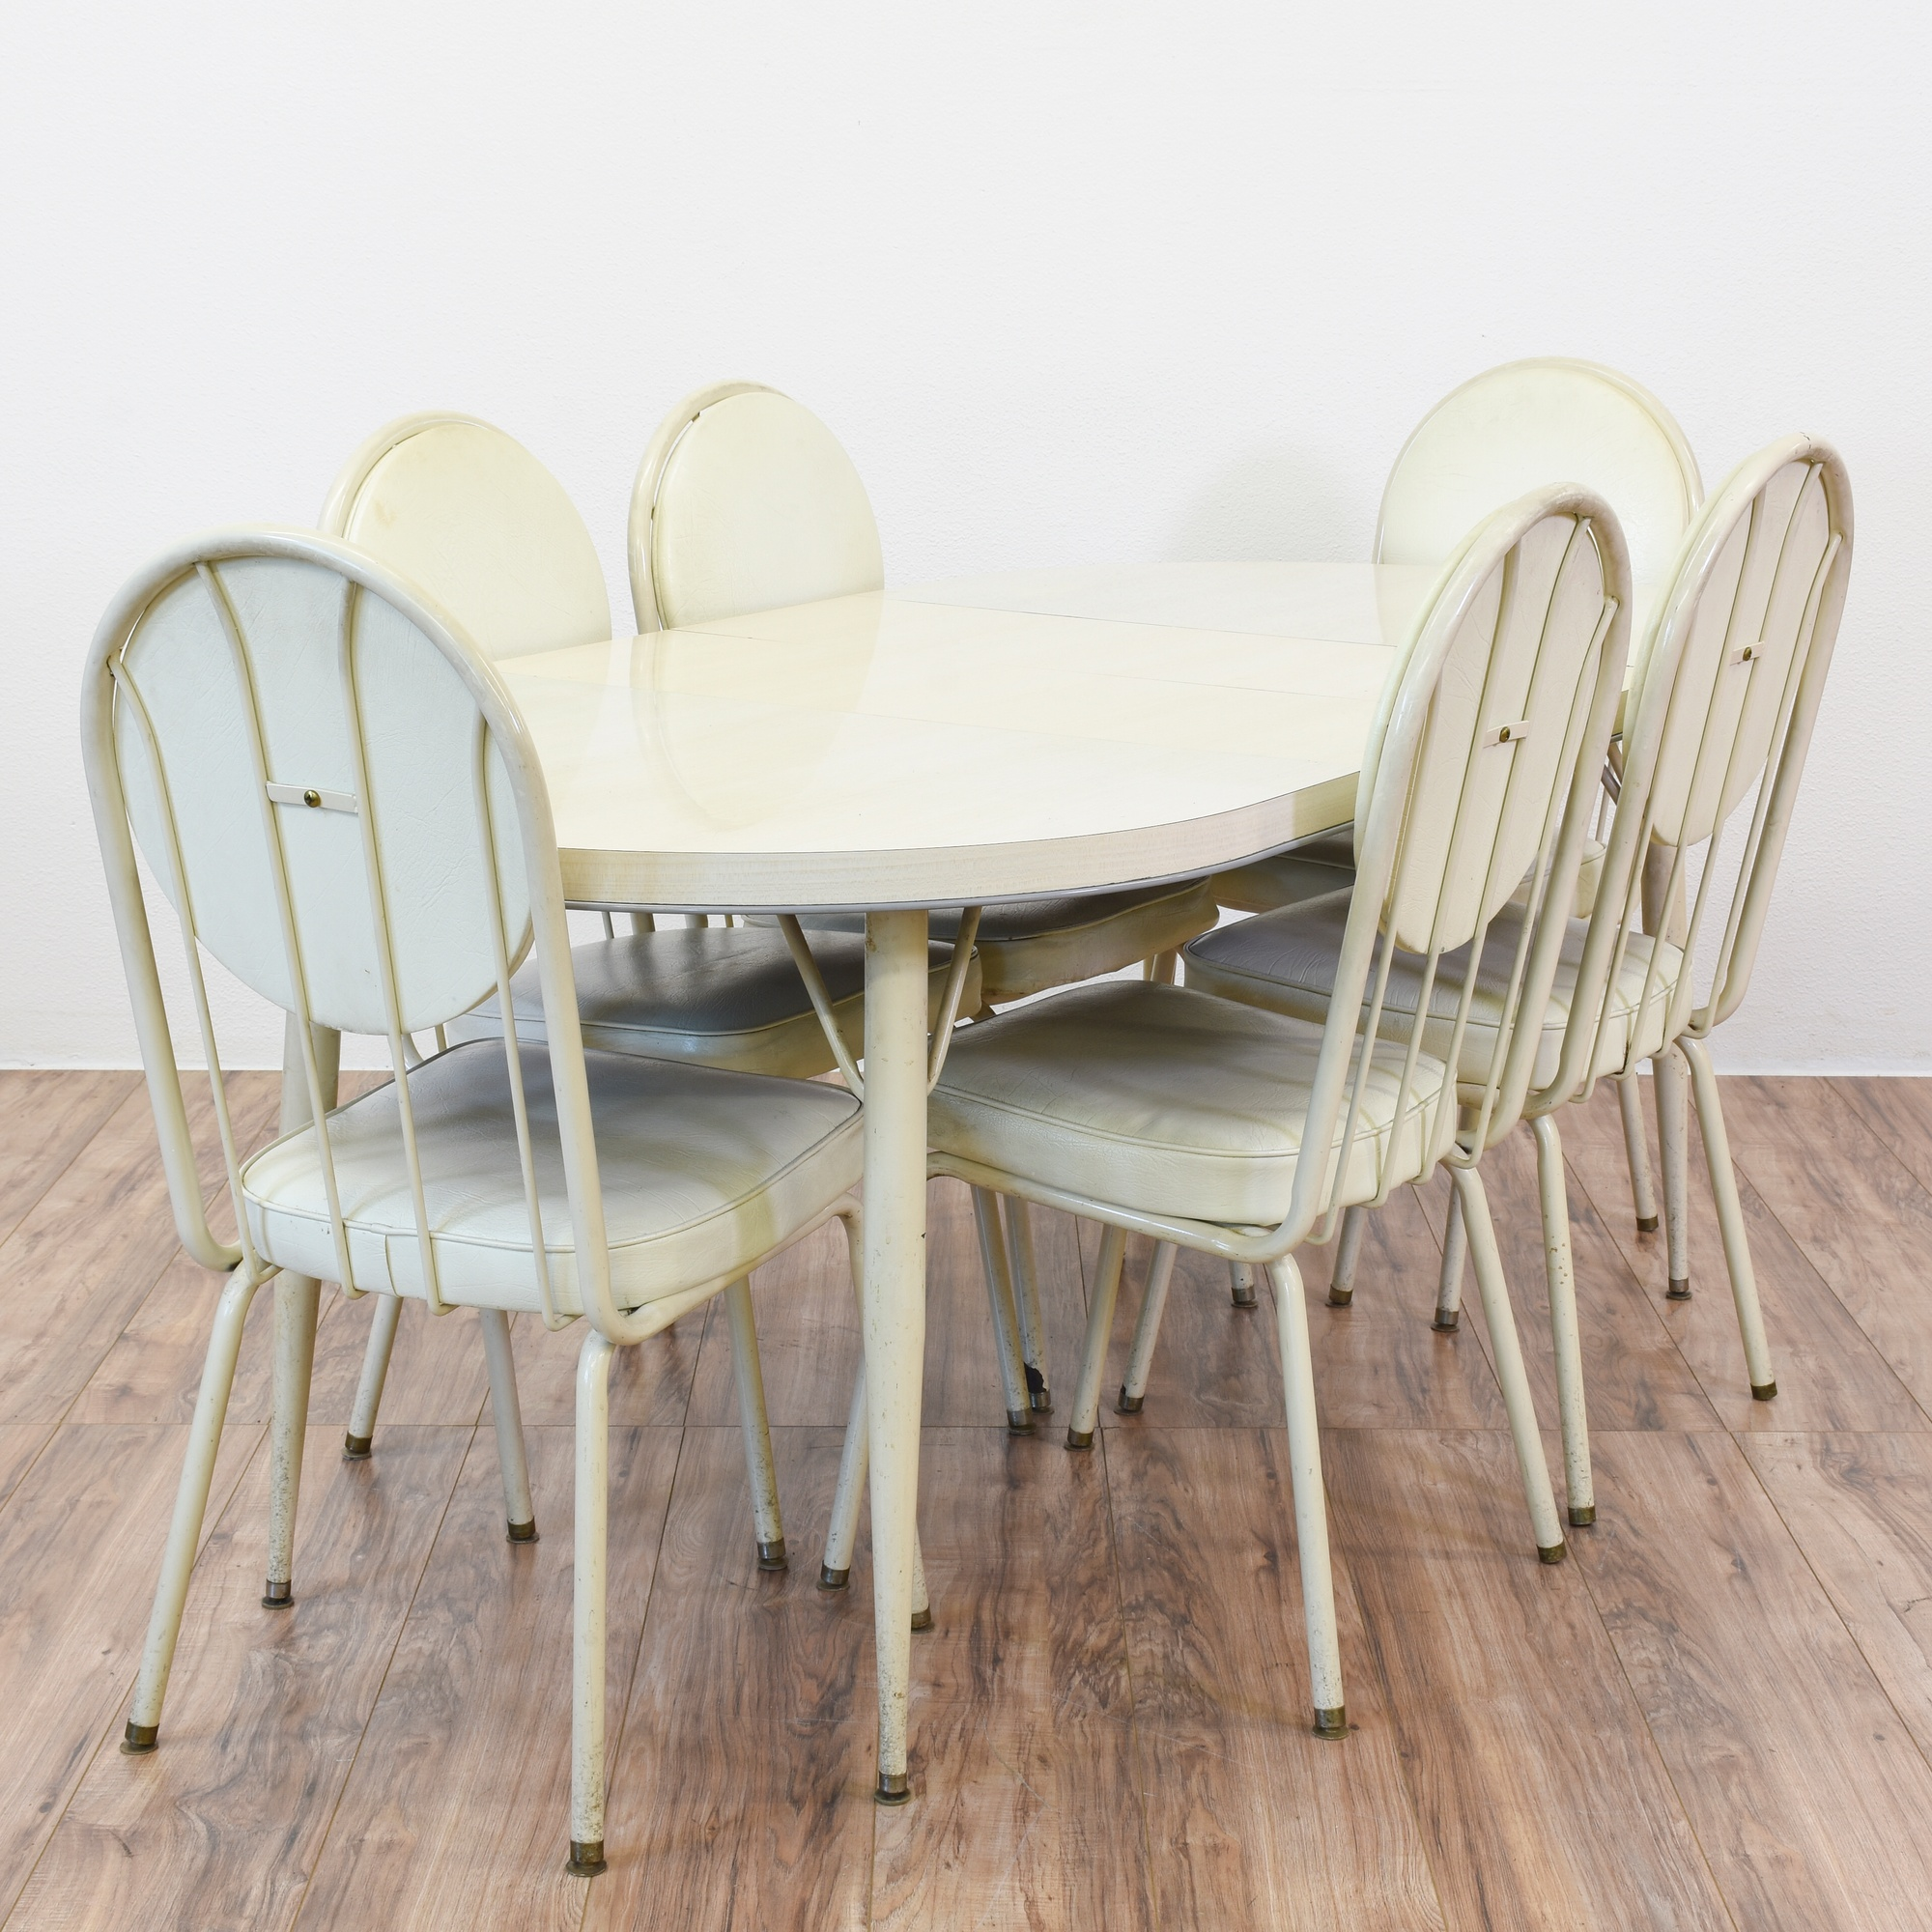 White Mid Century Modern Dining Set w/ 6 Chairs | Loveseat ...